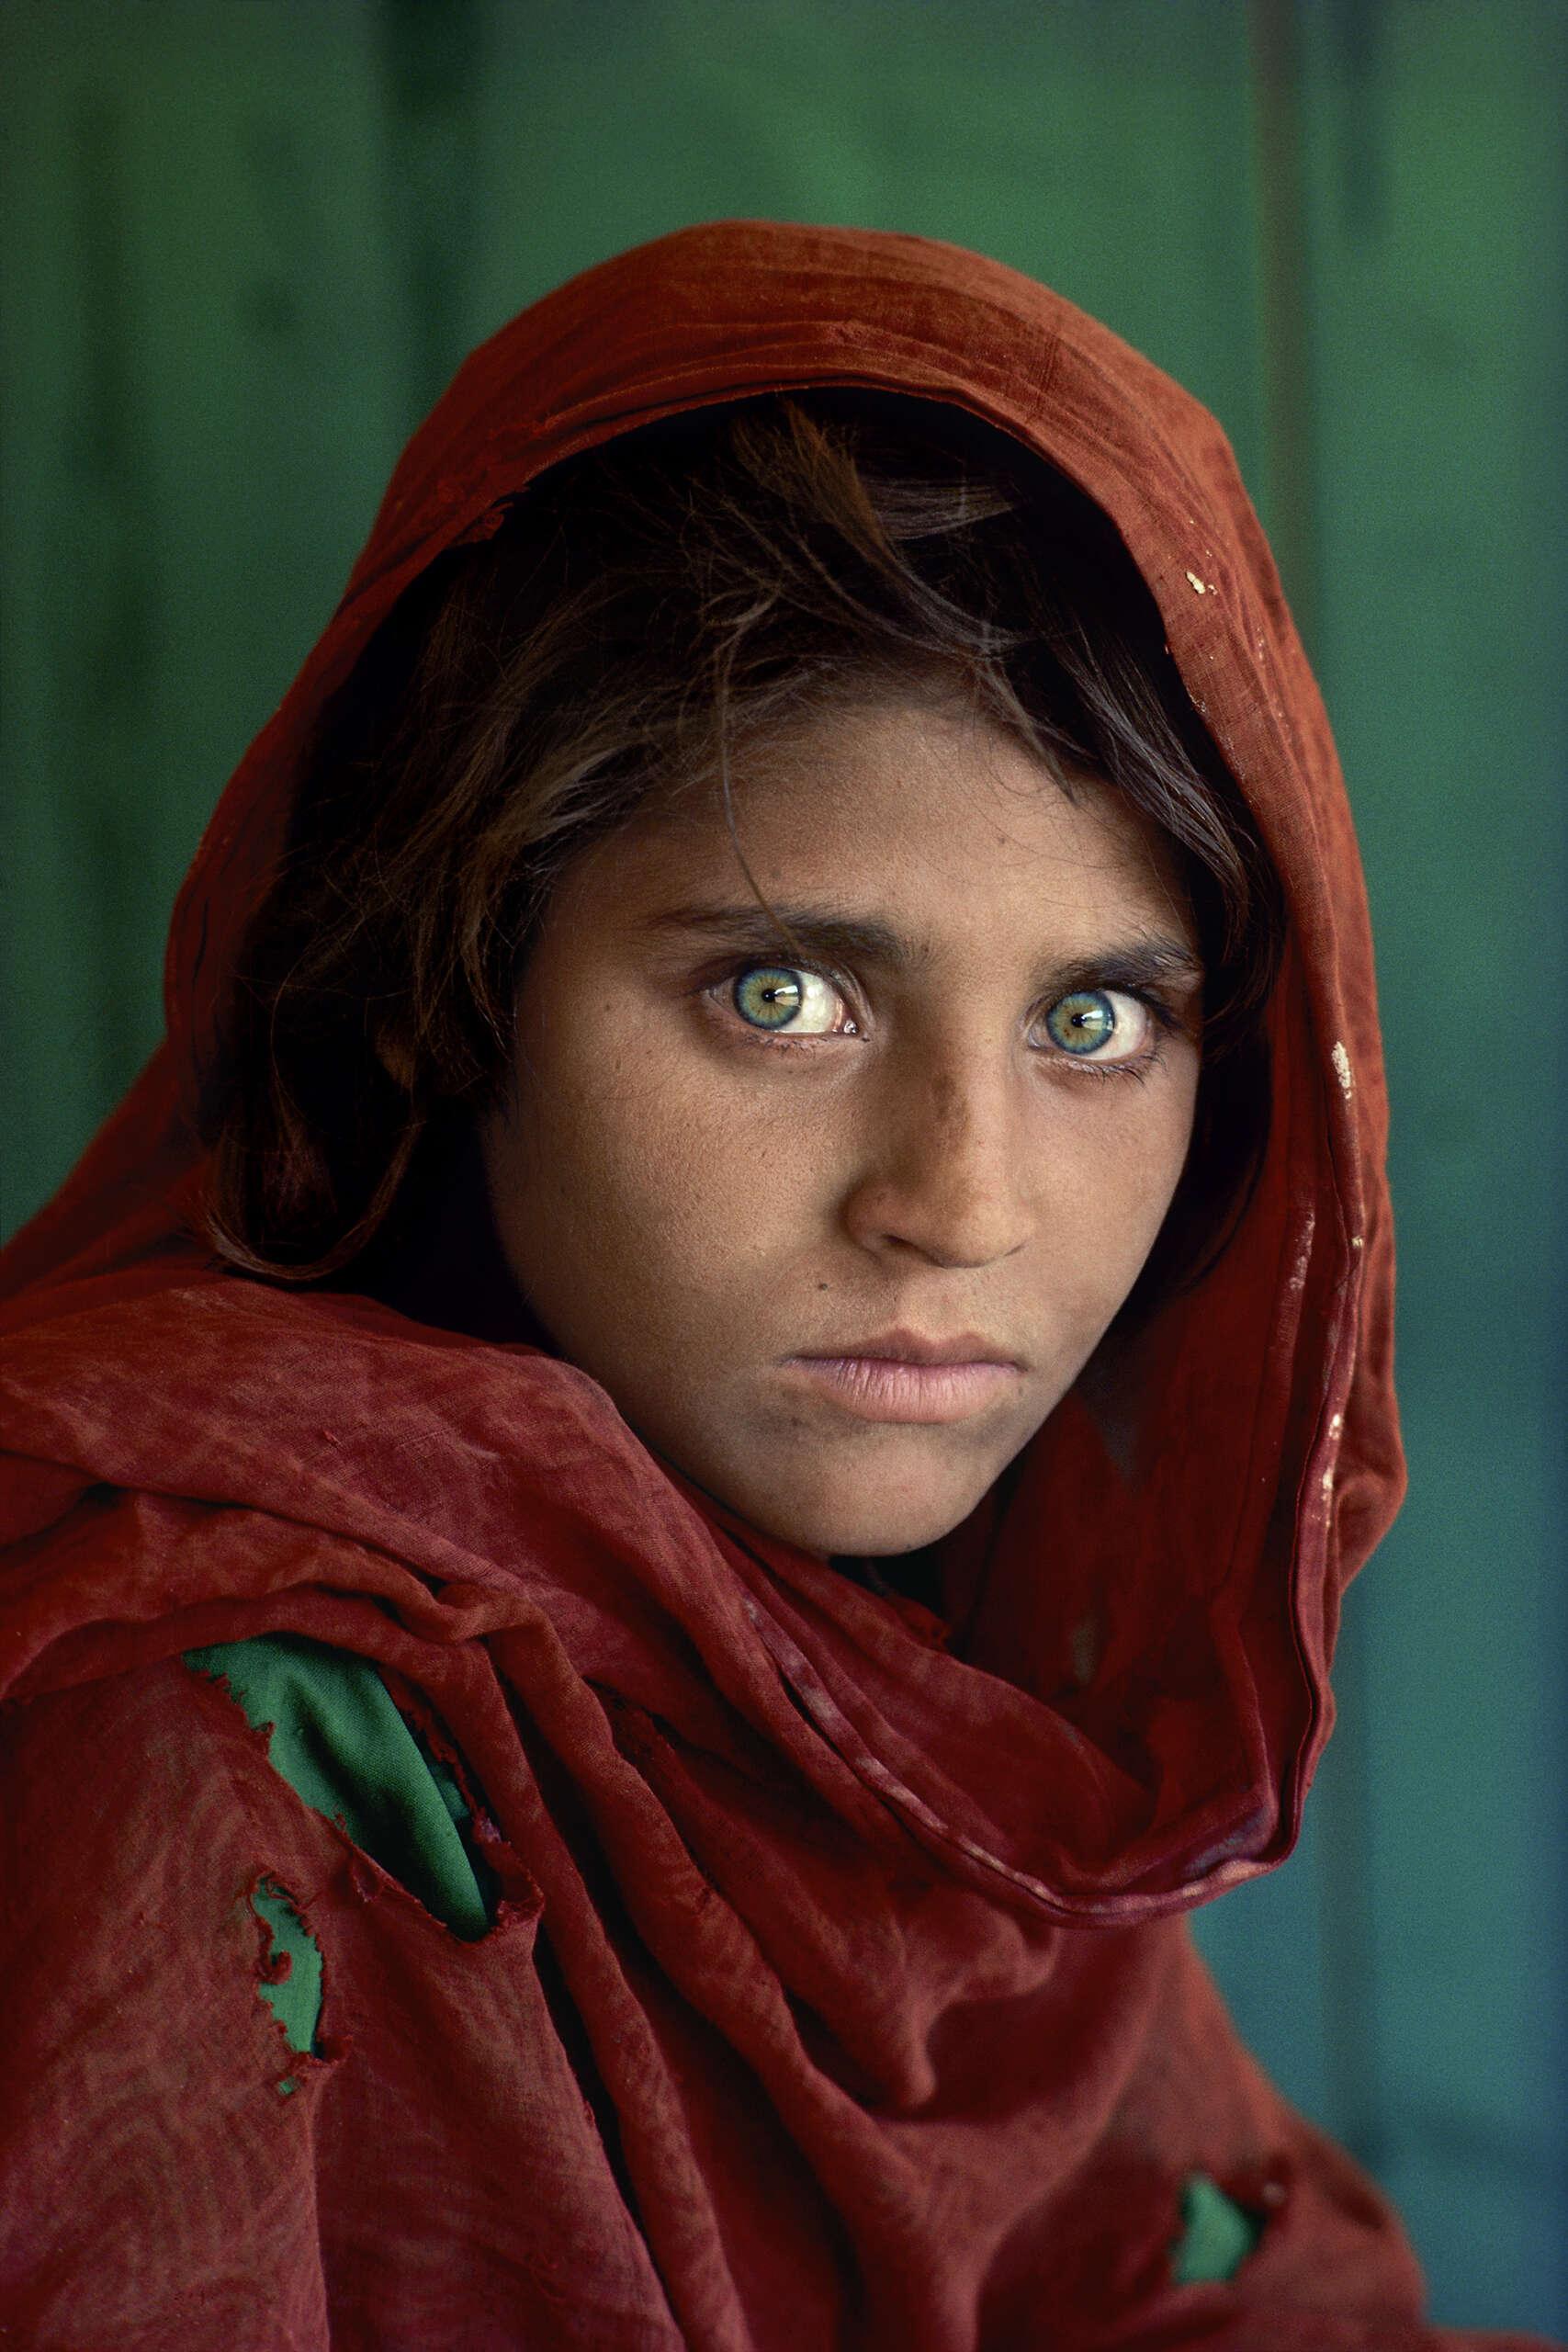 AFGHAN GIRL_The Eyes of Humanity © Steve McCurry